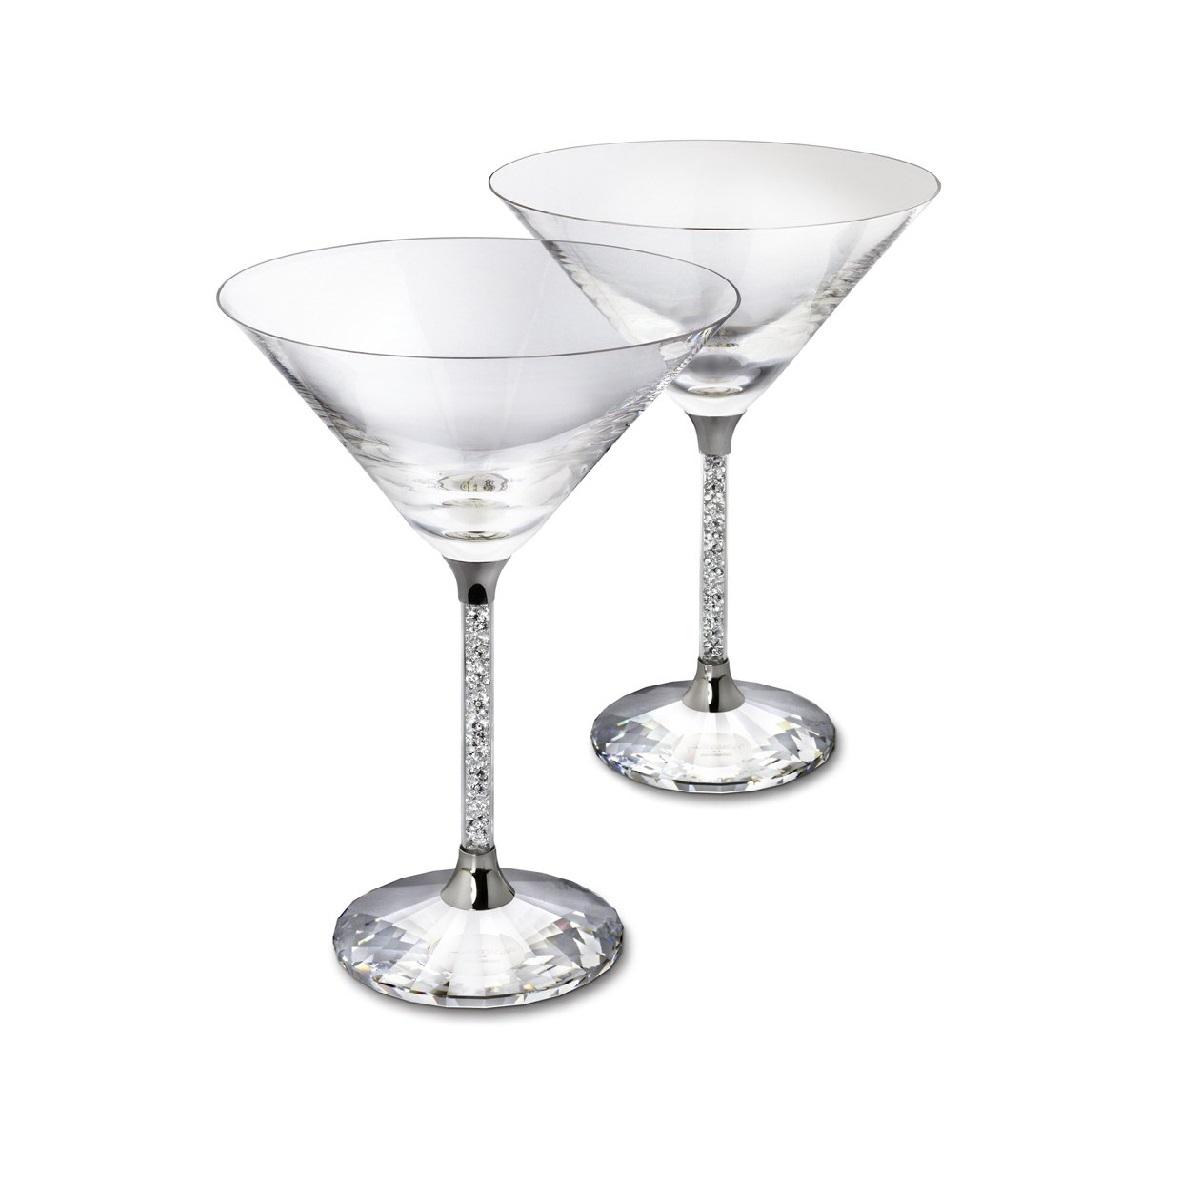 b475d0ceeb8 Pair of Swarovski Crystal Filled Stem Cocktail Glasses - Diamond Affair